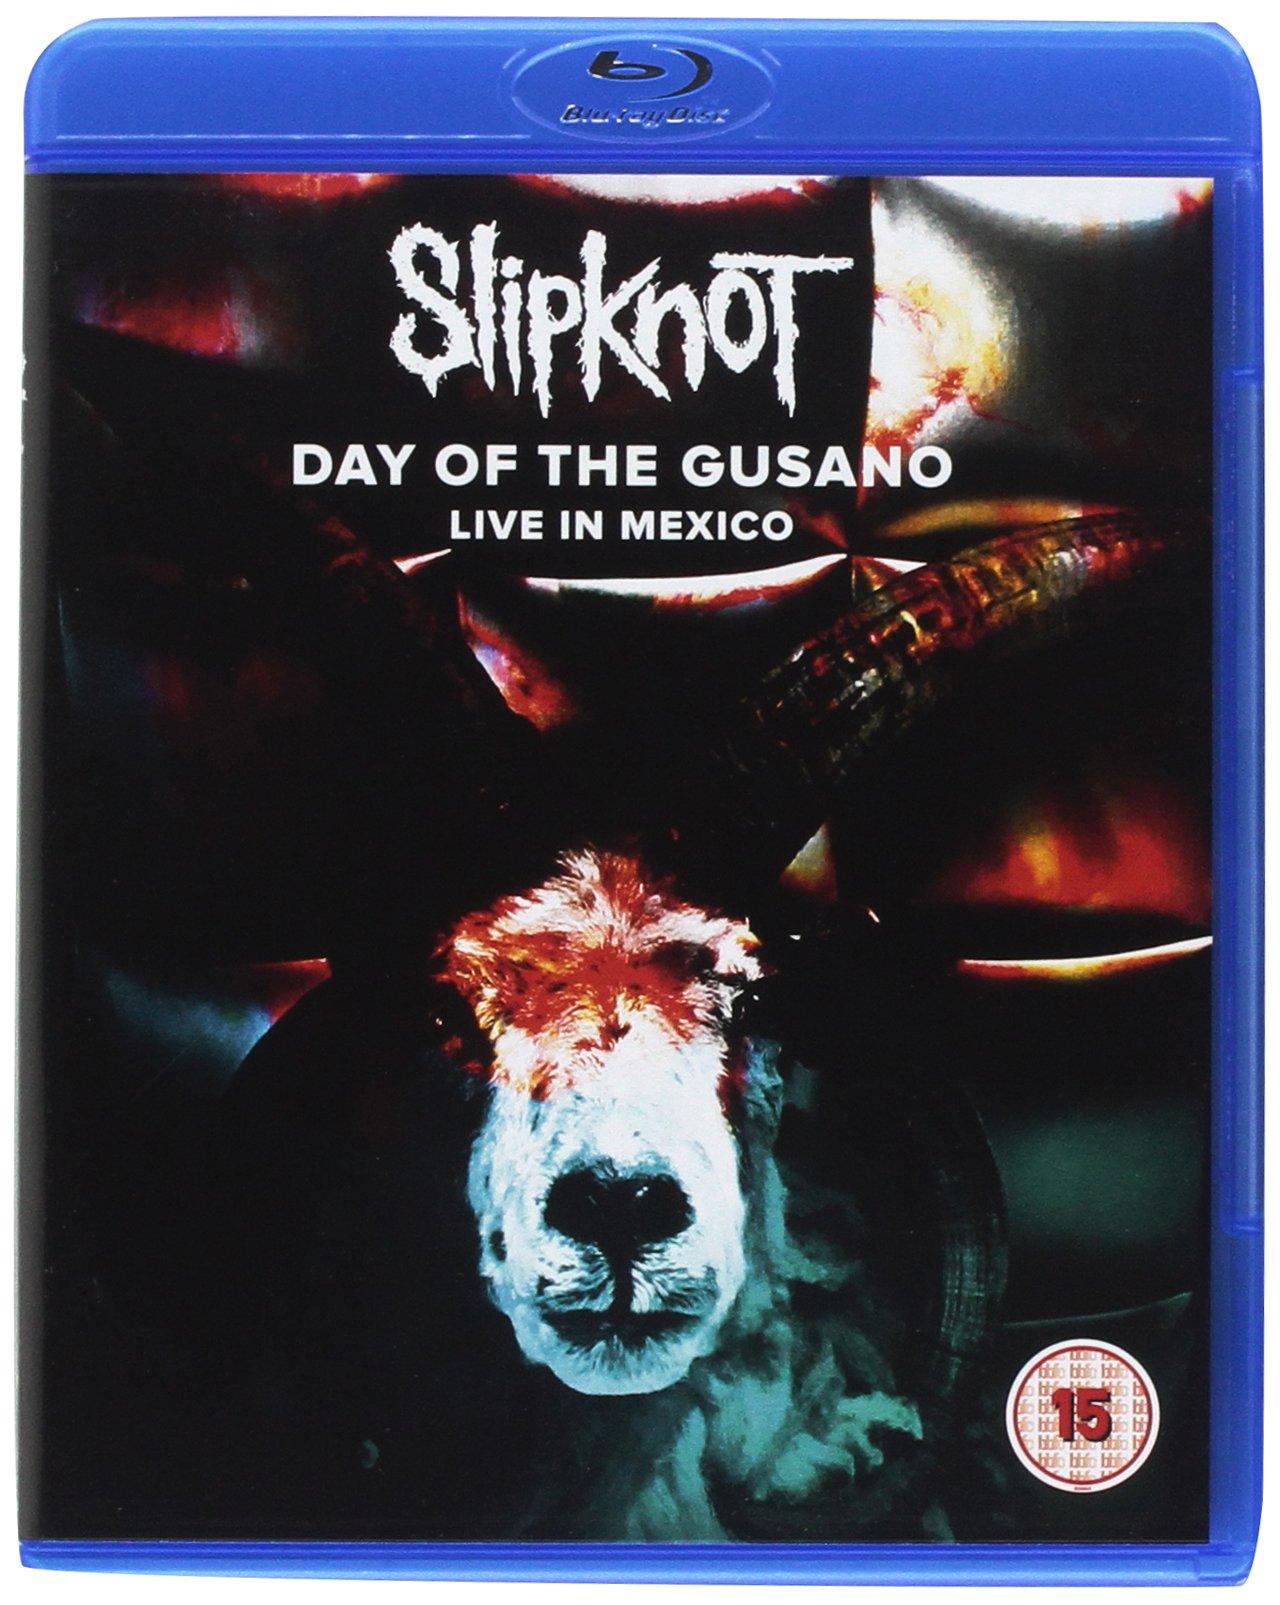 Blu-ray : Slipknot - Slipknot: Day of the Gusano: Live in Mexico (United Kingdom - Import)